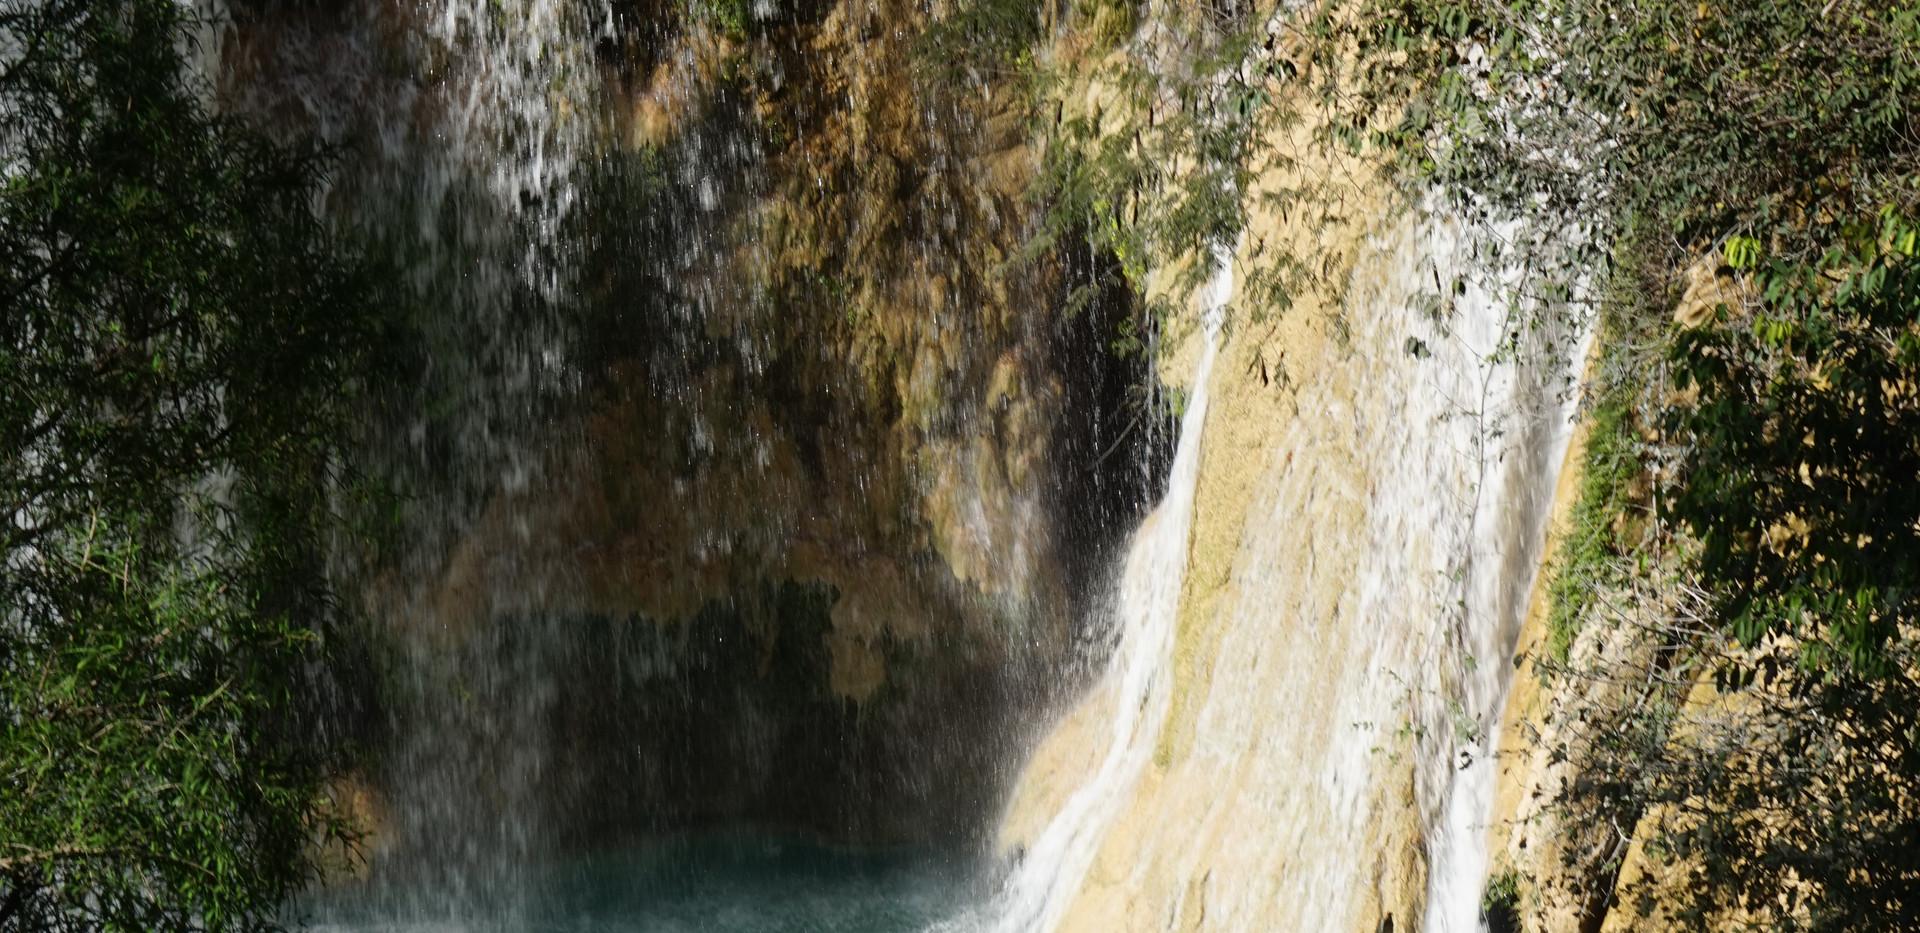 Cascades El Chiflon.JPG